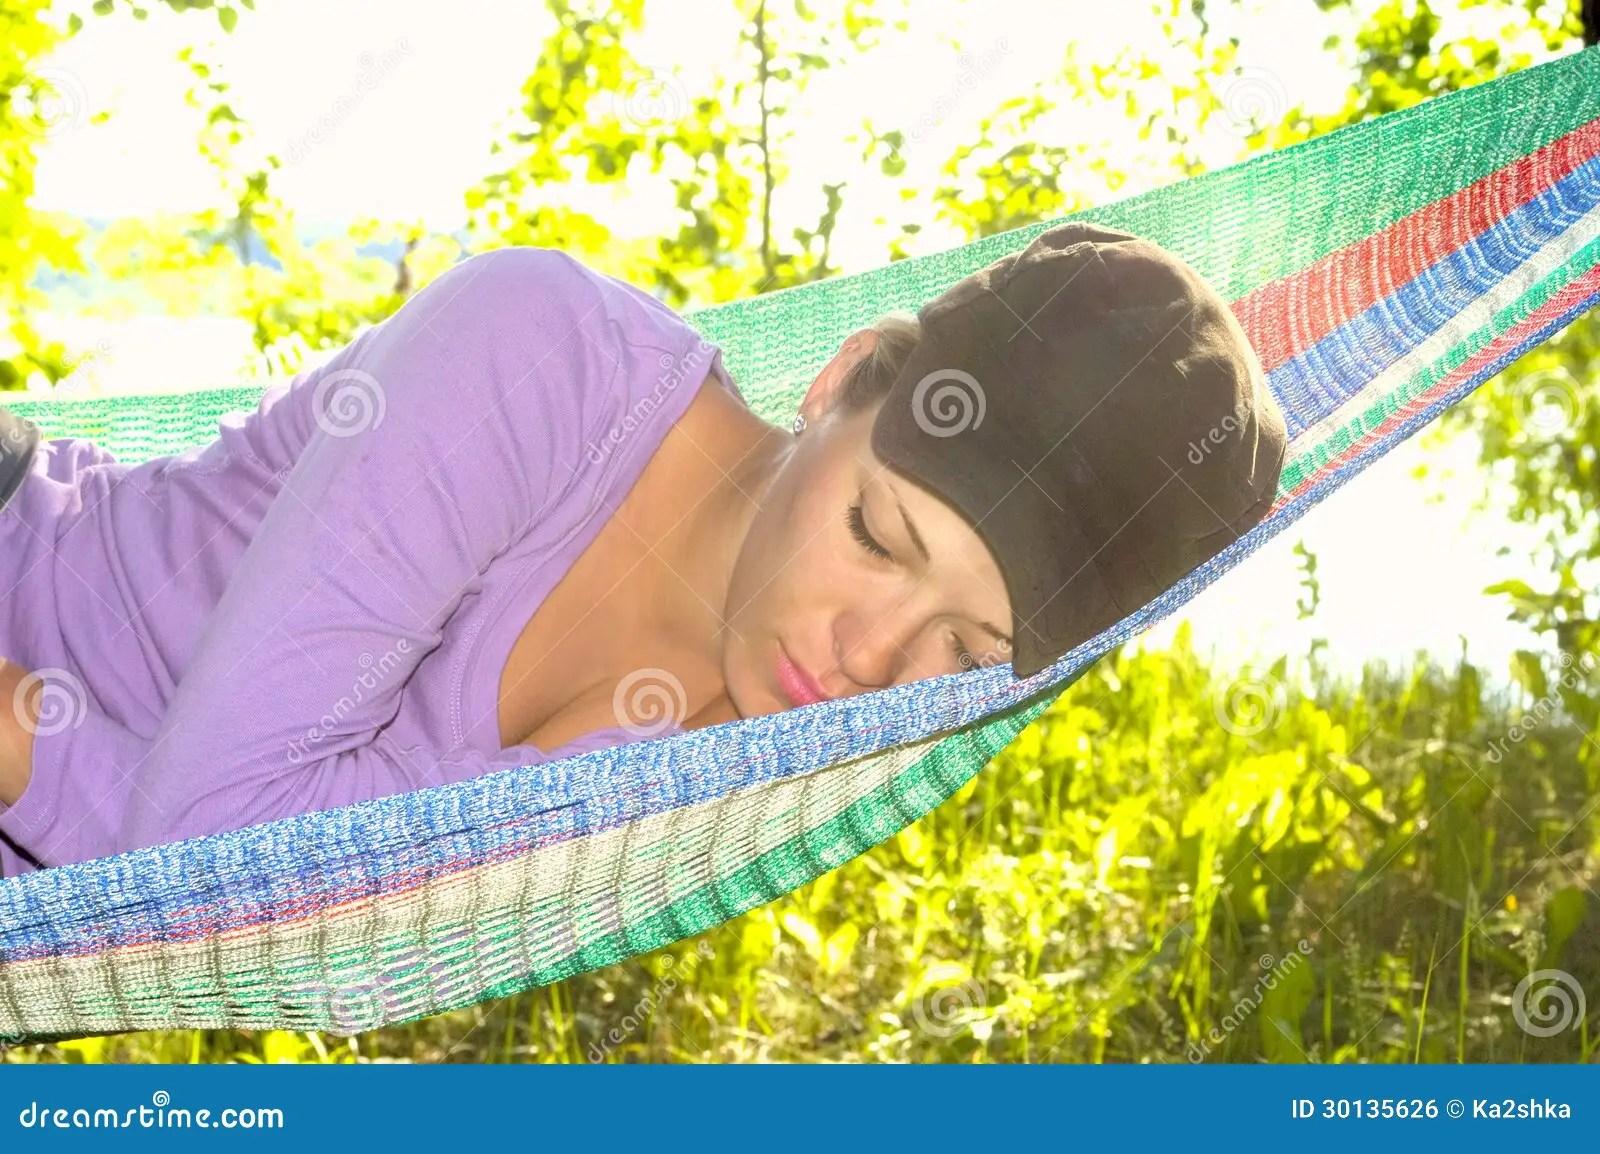 Girl Sleeping In A Hammock Stock Photo Image Of Lifestyle